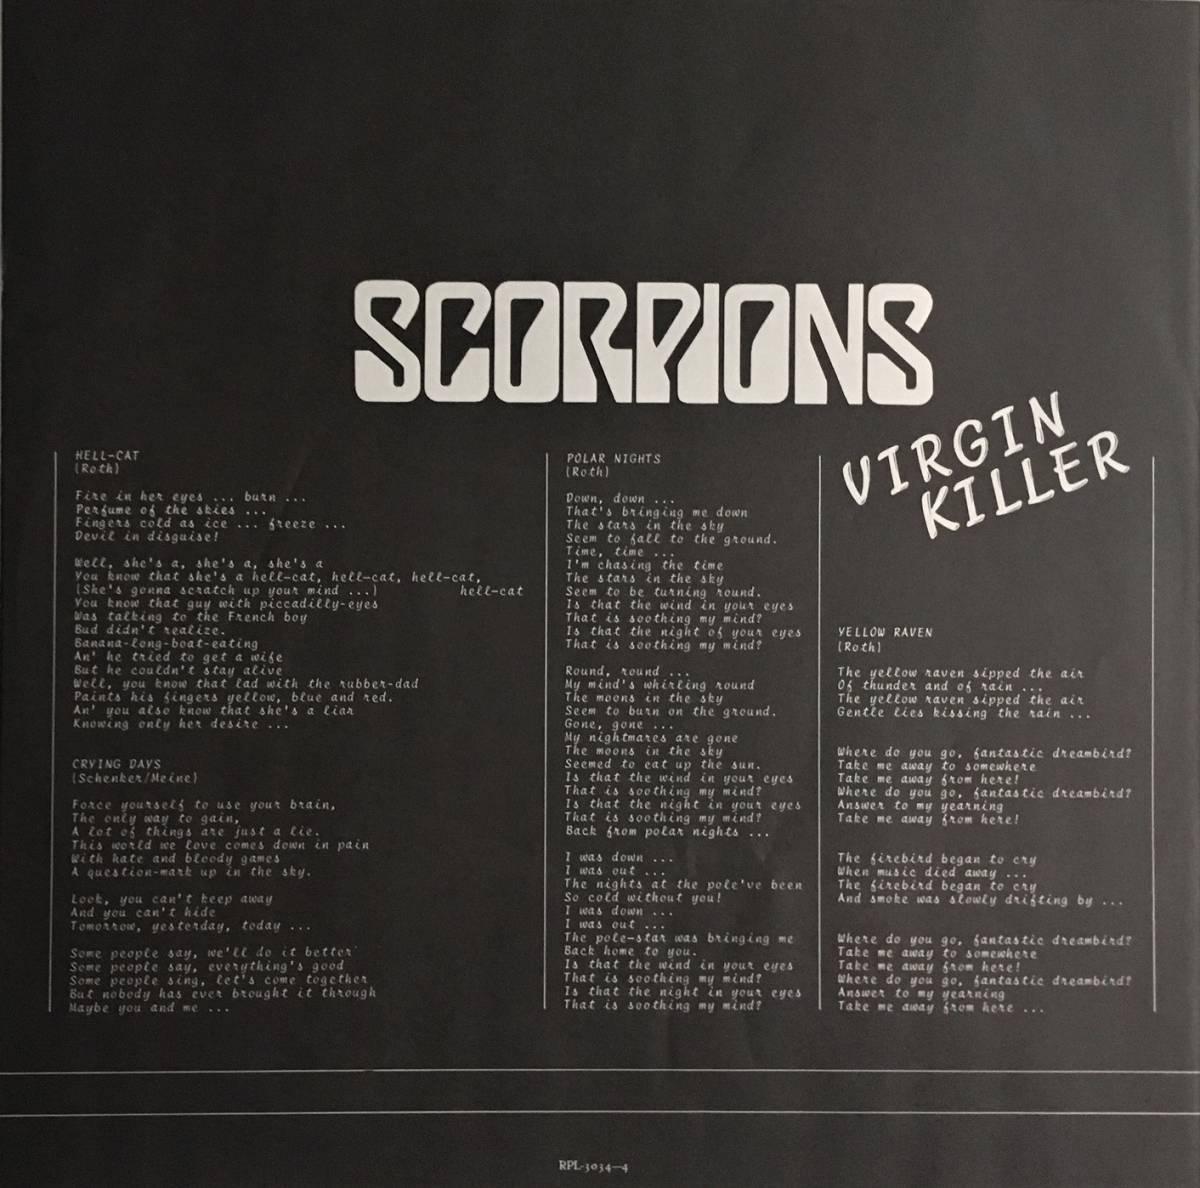 ☆☆【LPレコード】スコーピオンズ SCORPIONS VIRGIN KILLER ★★_画像3